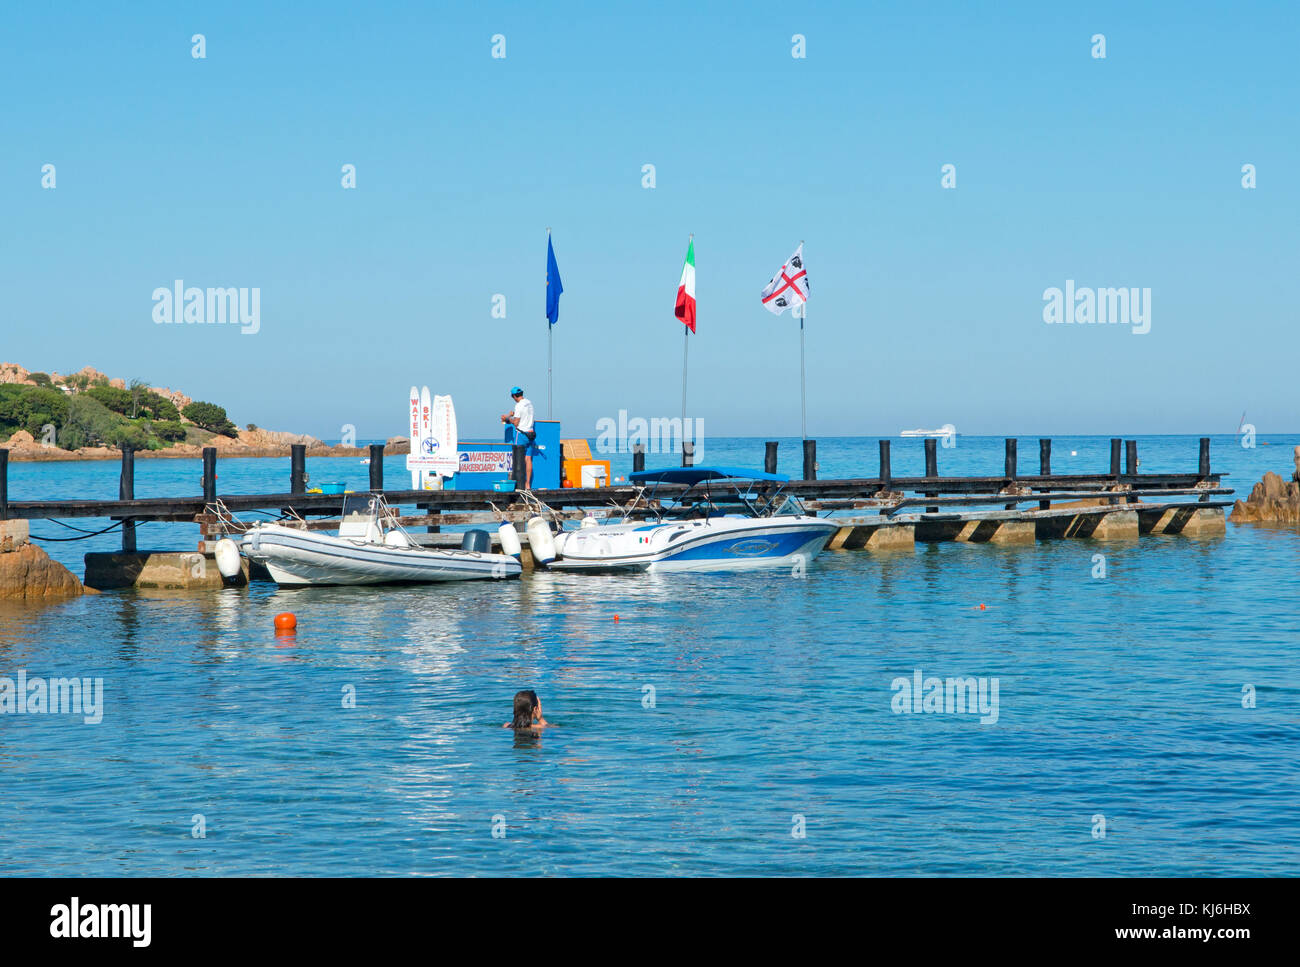 Foreshortening, Romazzino, Costa smeralda, Sardinia, Italy - Stock Image